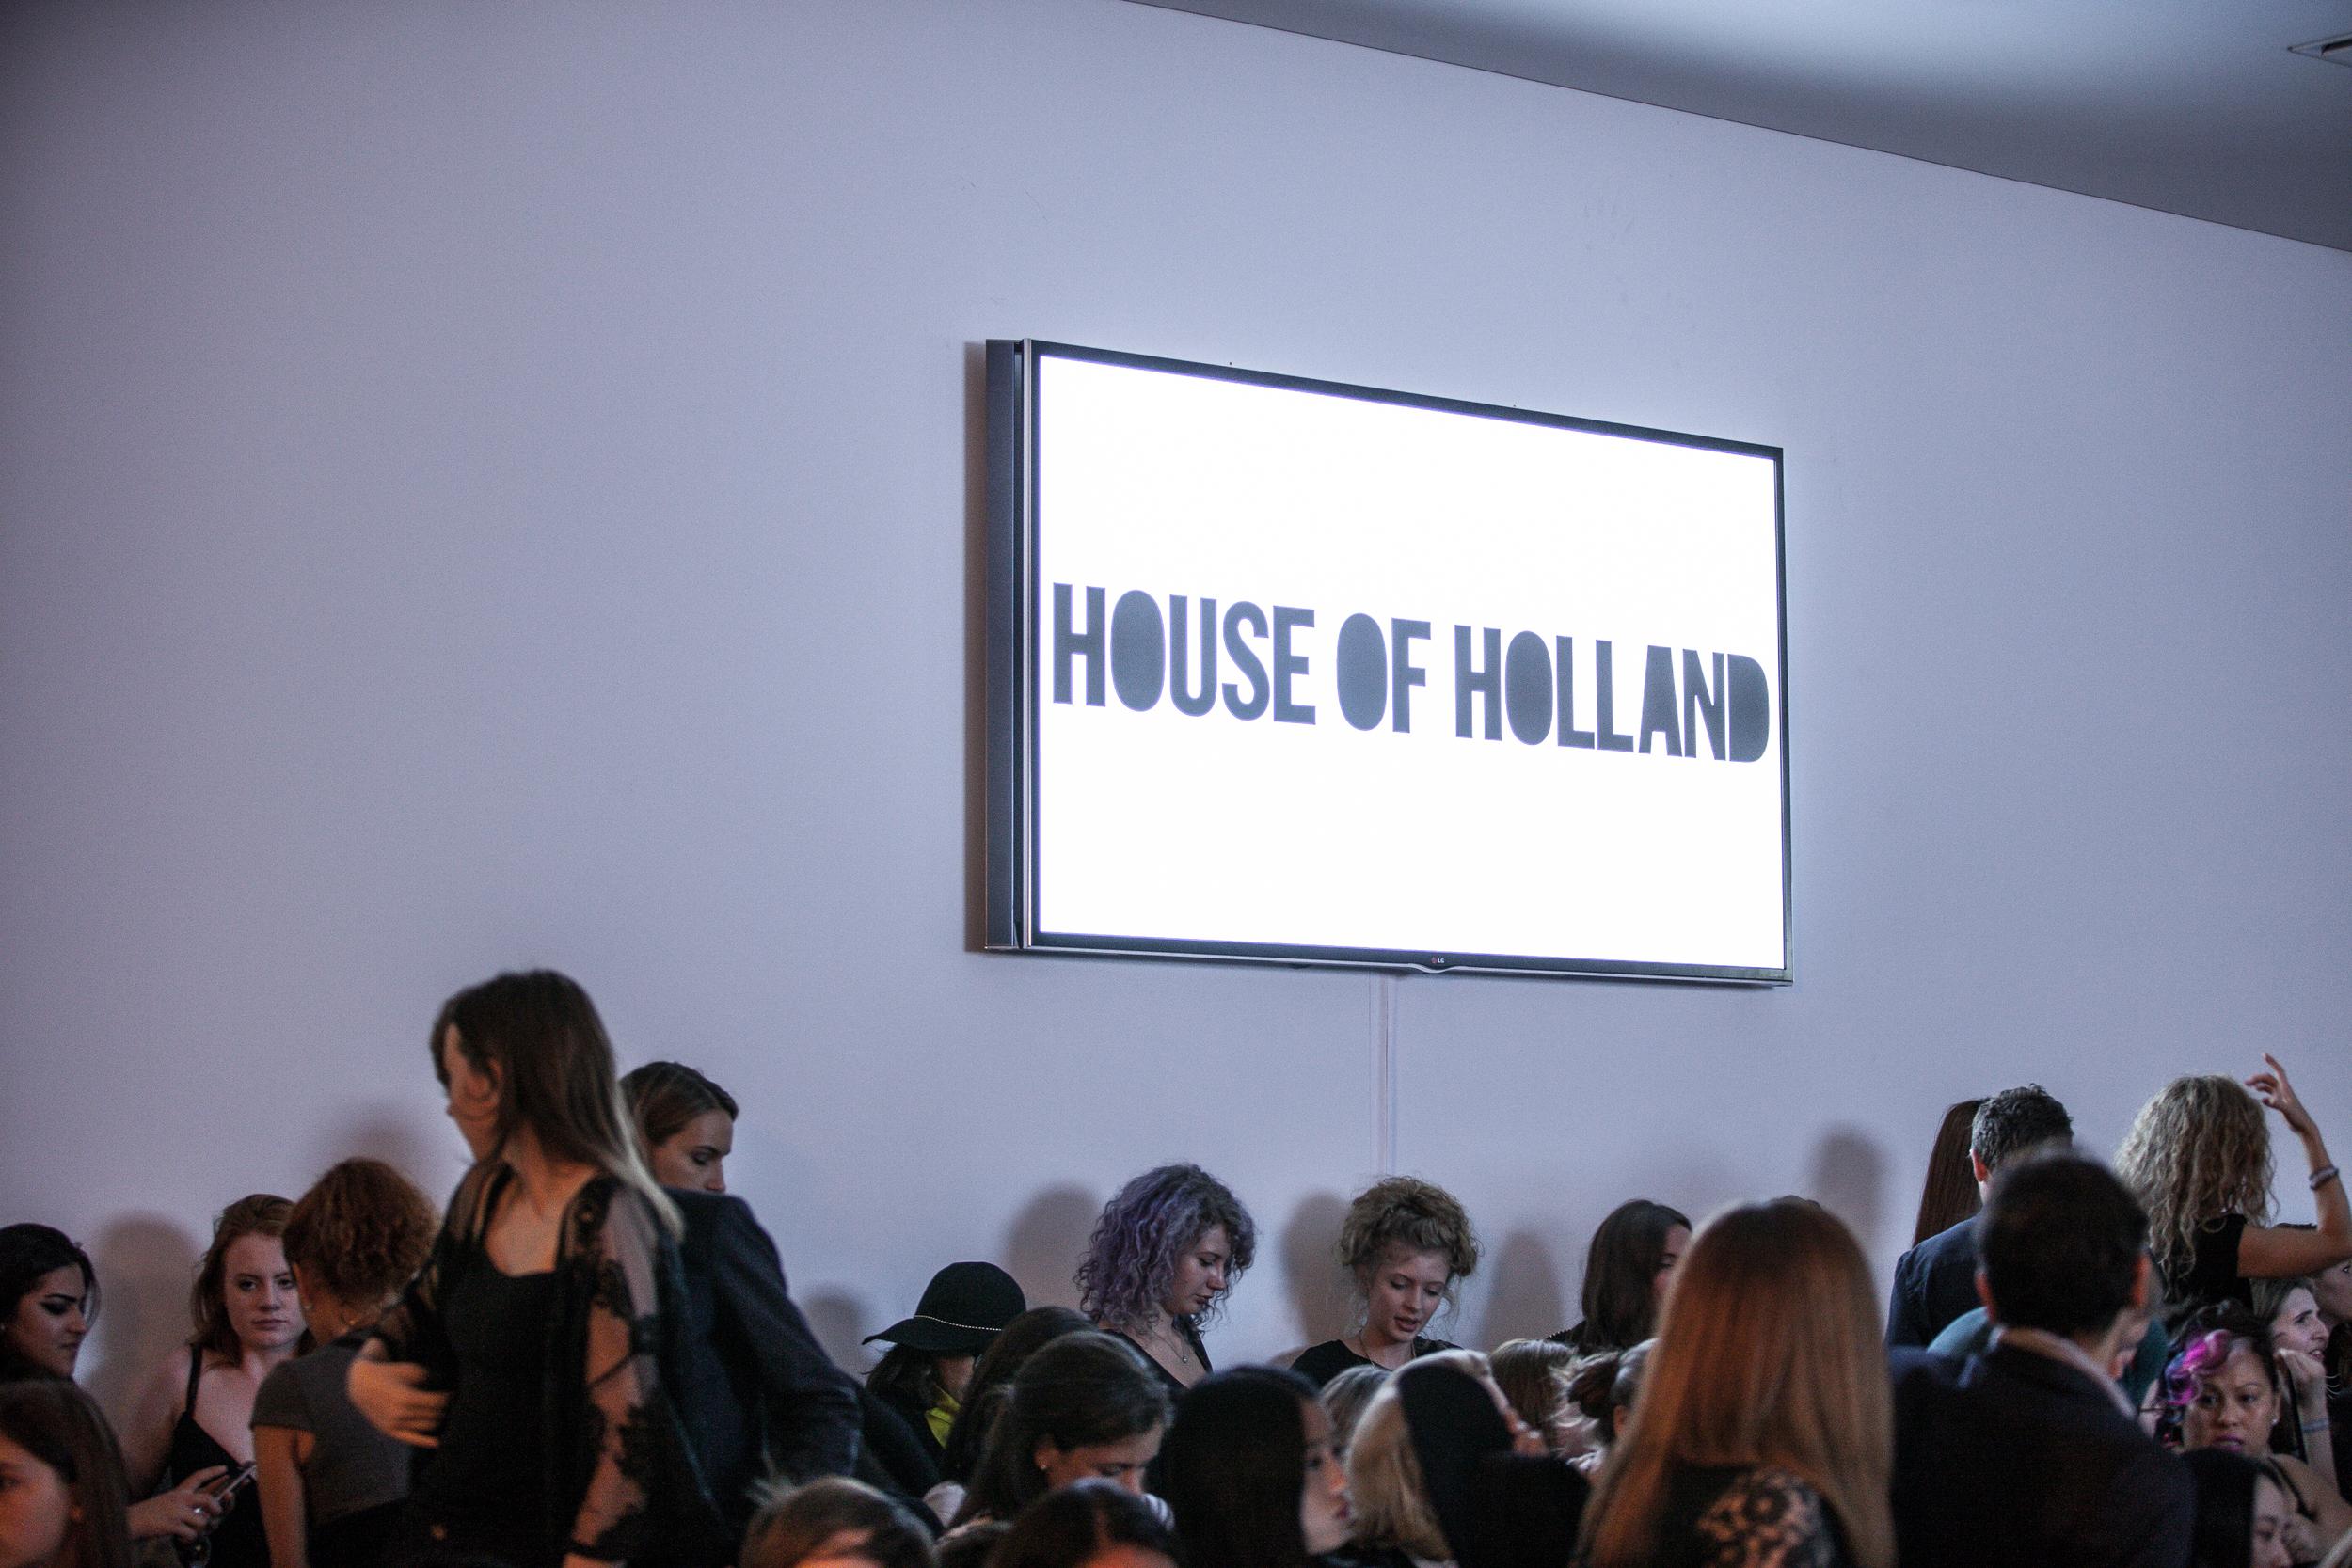 London_Fashion_Week_by_Sam_Geals_InlineSix_Photography0409.jpg